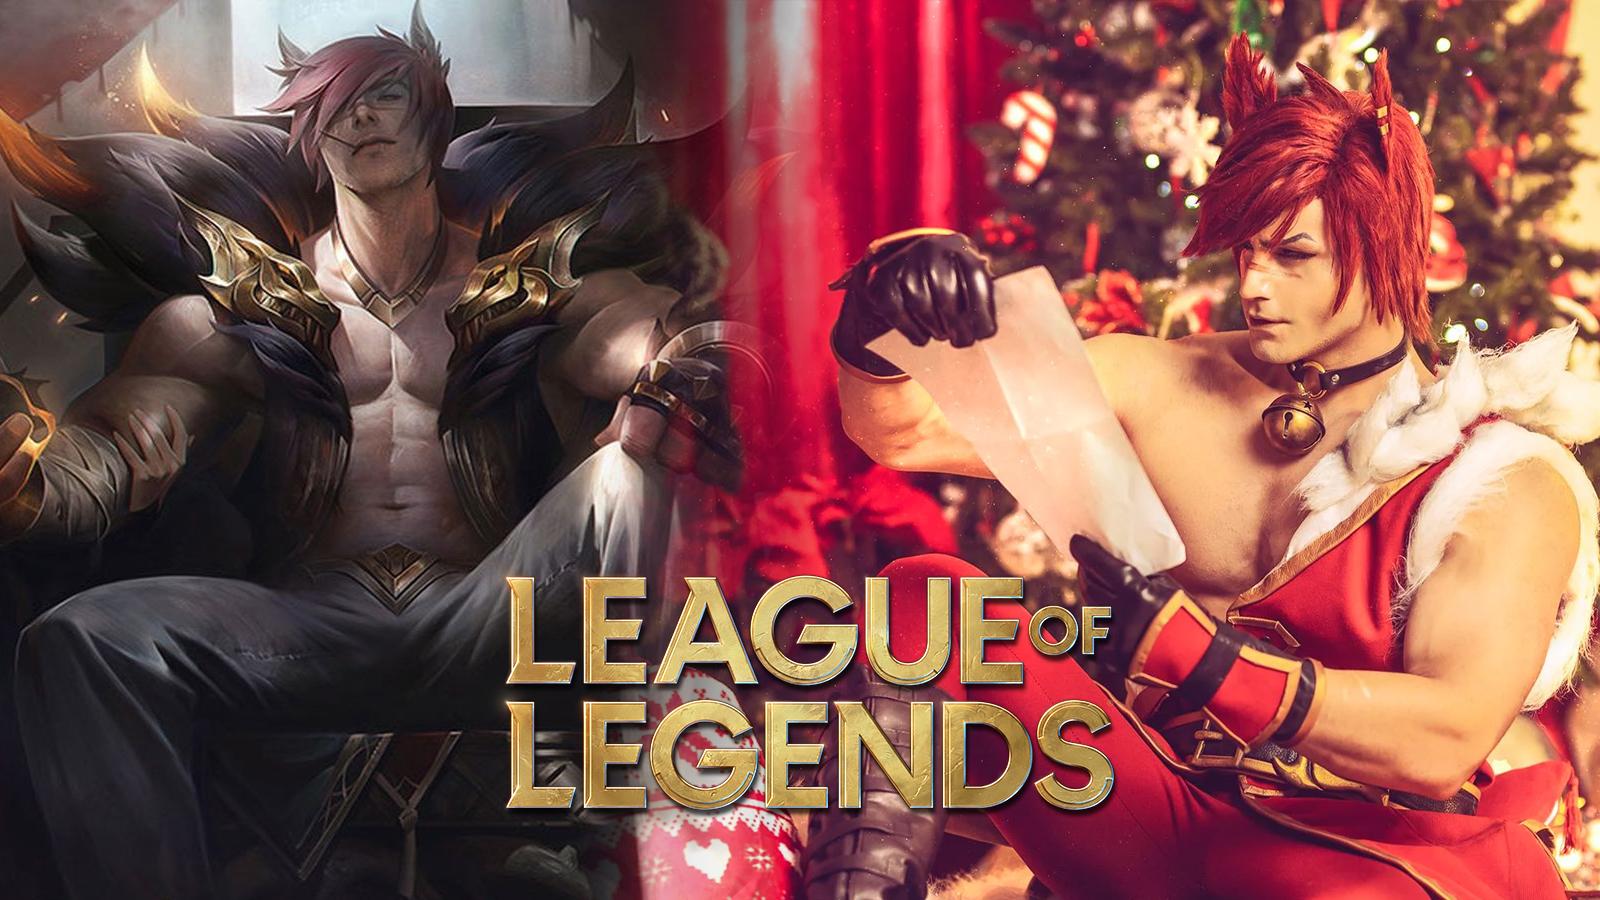 Christmas Sett cosplay in League of Legends by Taryn